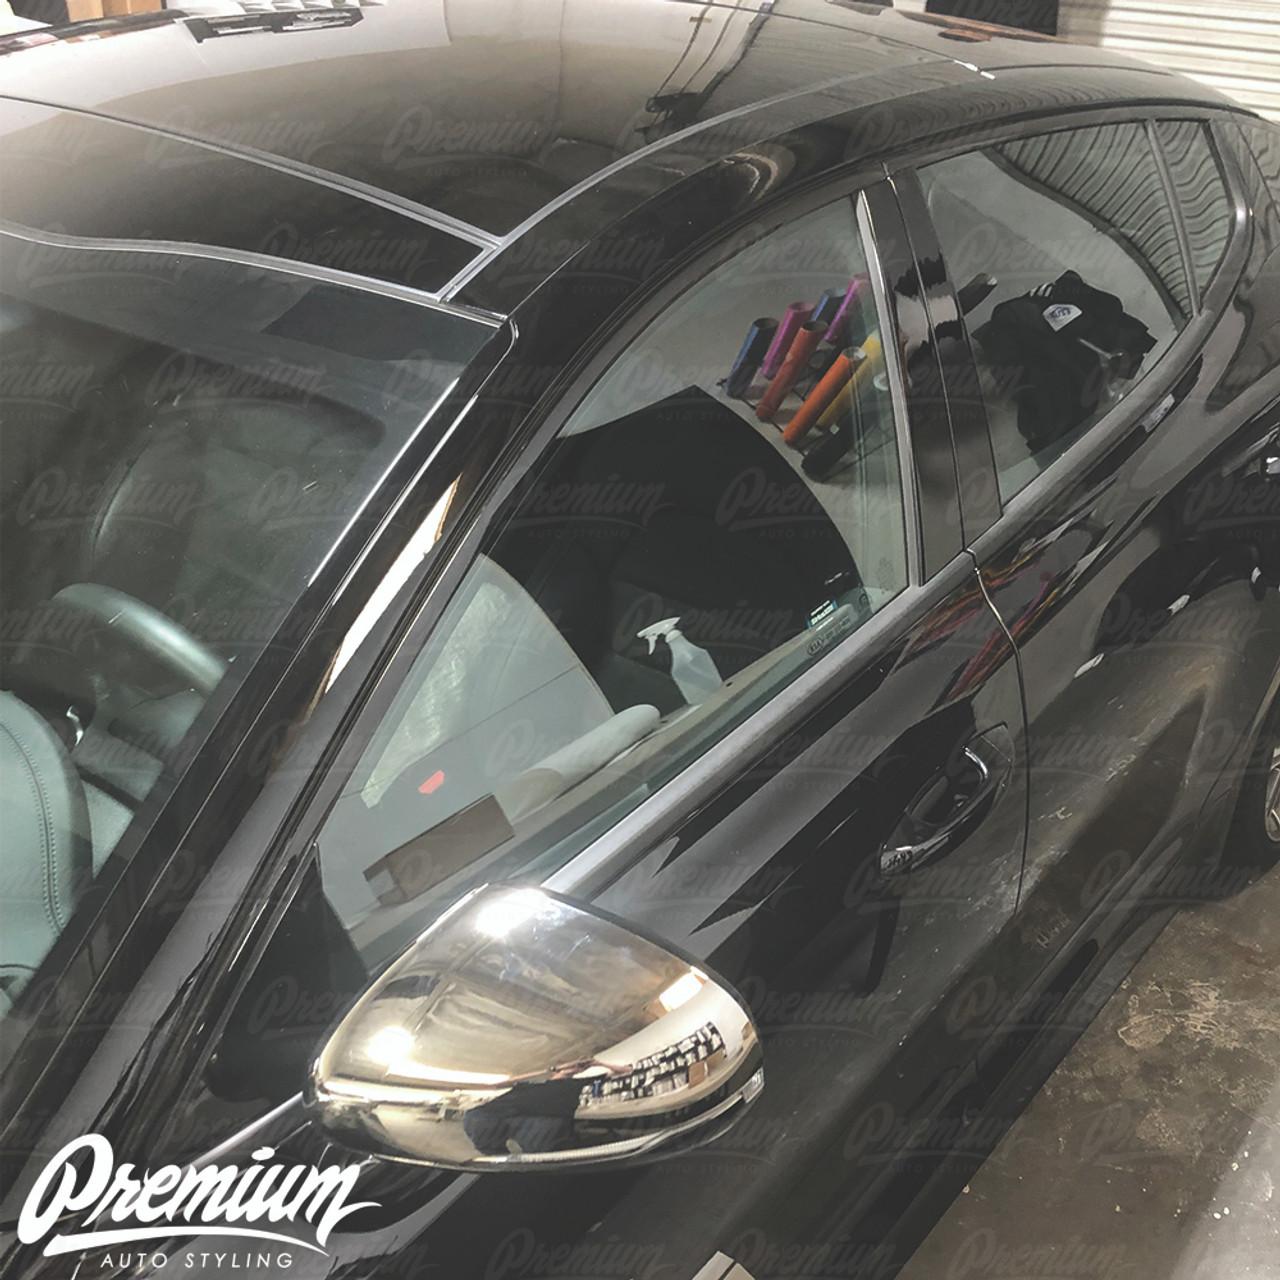 Window Trim Chrome Delete Vinyl Overlay Kit - Gloss Black | 2018-2019 Kia  Stinger GT